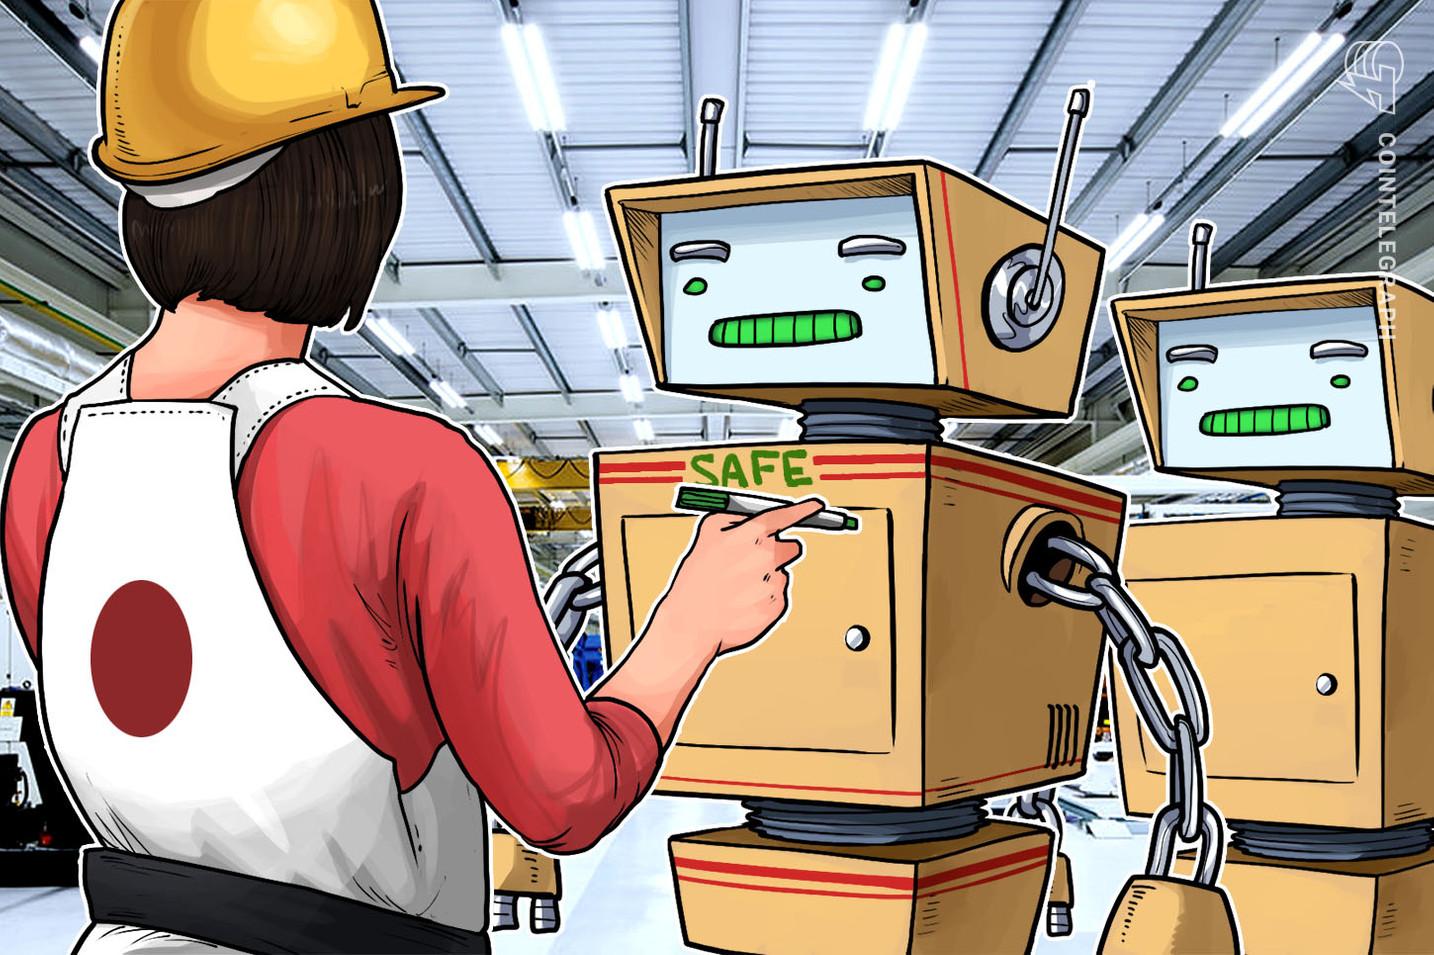 Japanische Cybersicherheitsgruppe: Neues Blockchain-Scan-Tool in Partnerschaft mit ConsenSys